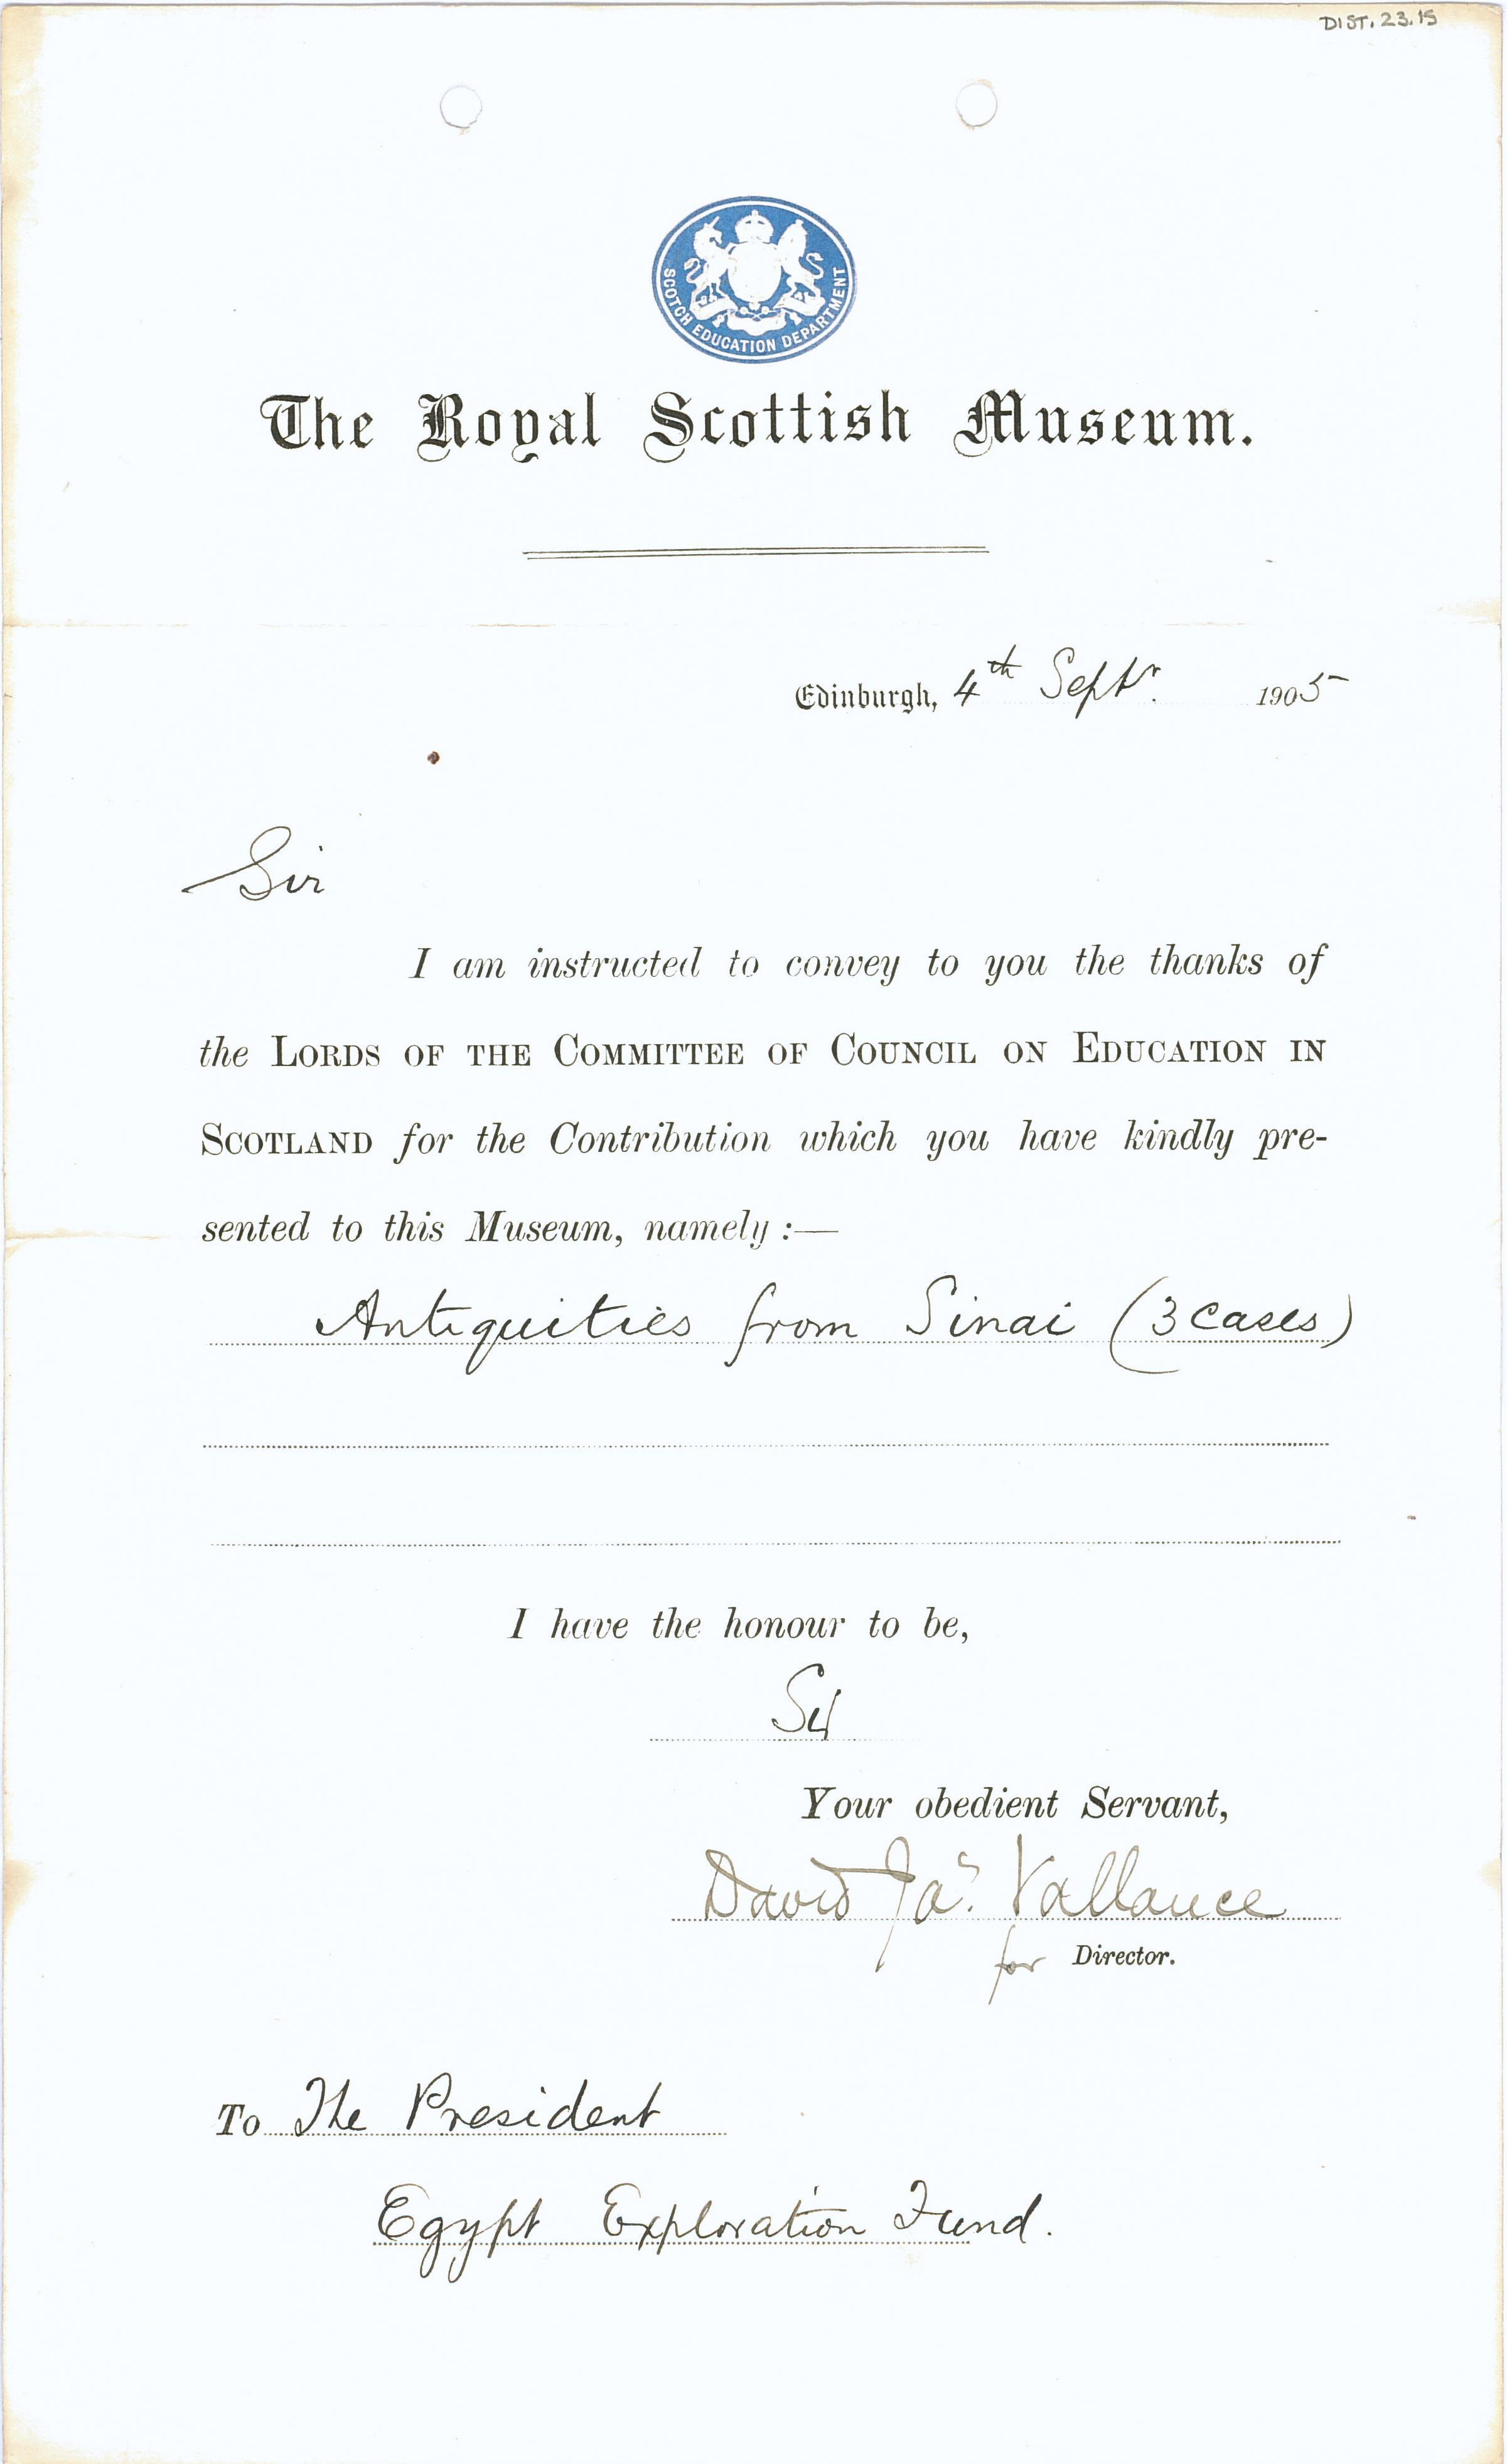 1904-05 Sinai, Deir el-Bahri, Oxyrhynchus, Naukratis DIST.23.15